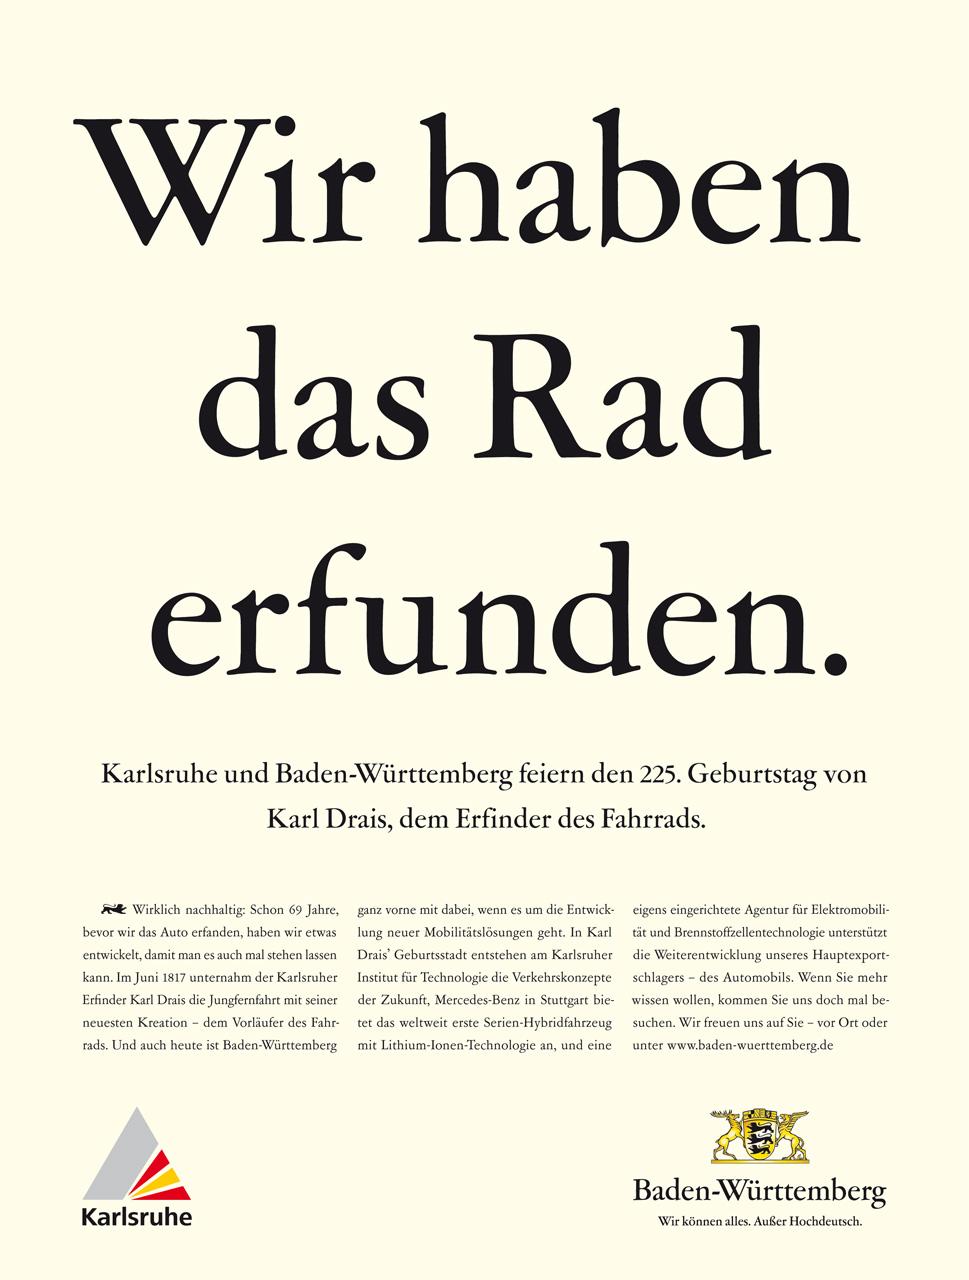 Baden-Württemberg - Standortkampagne